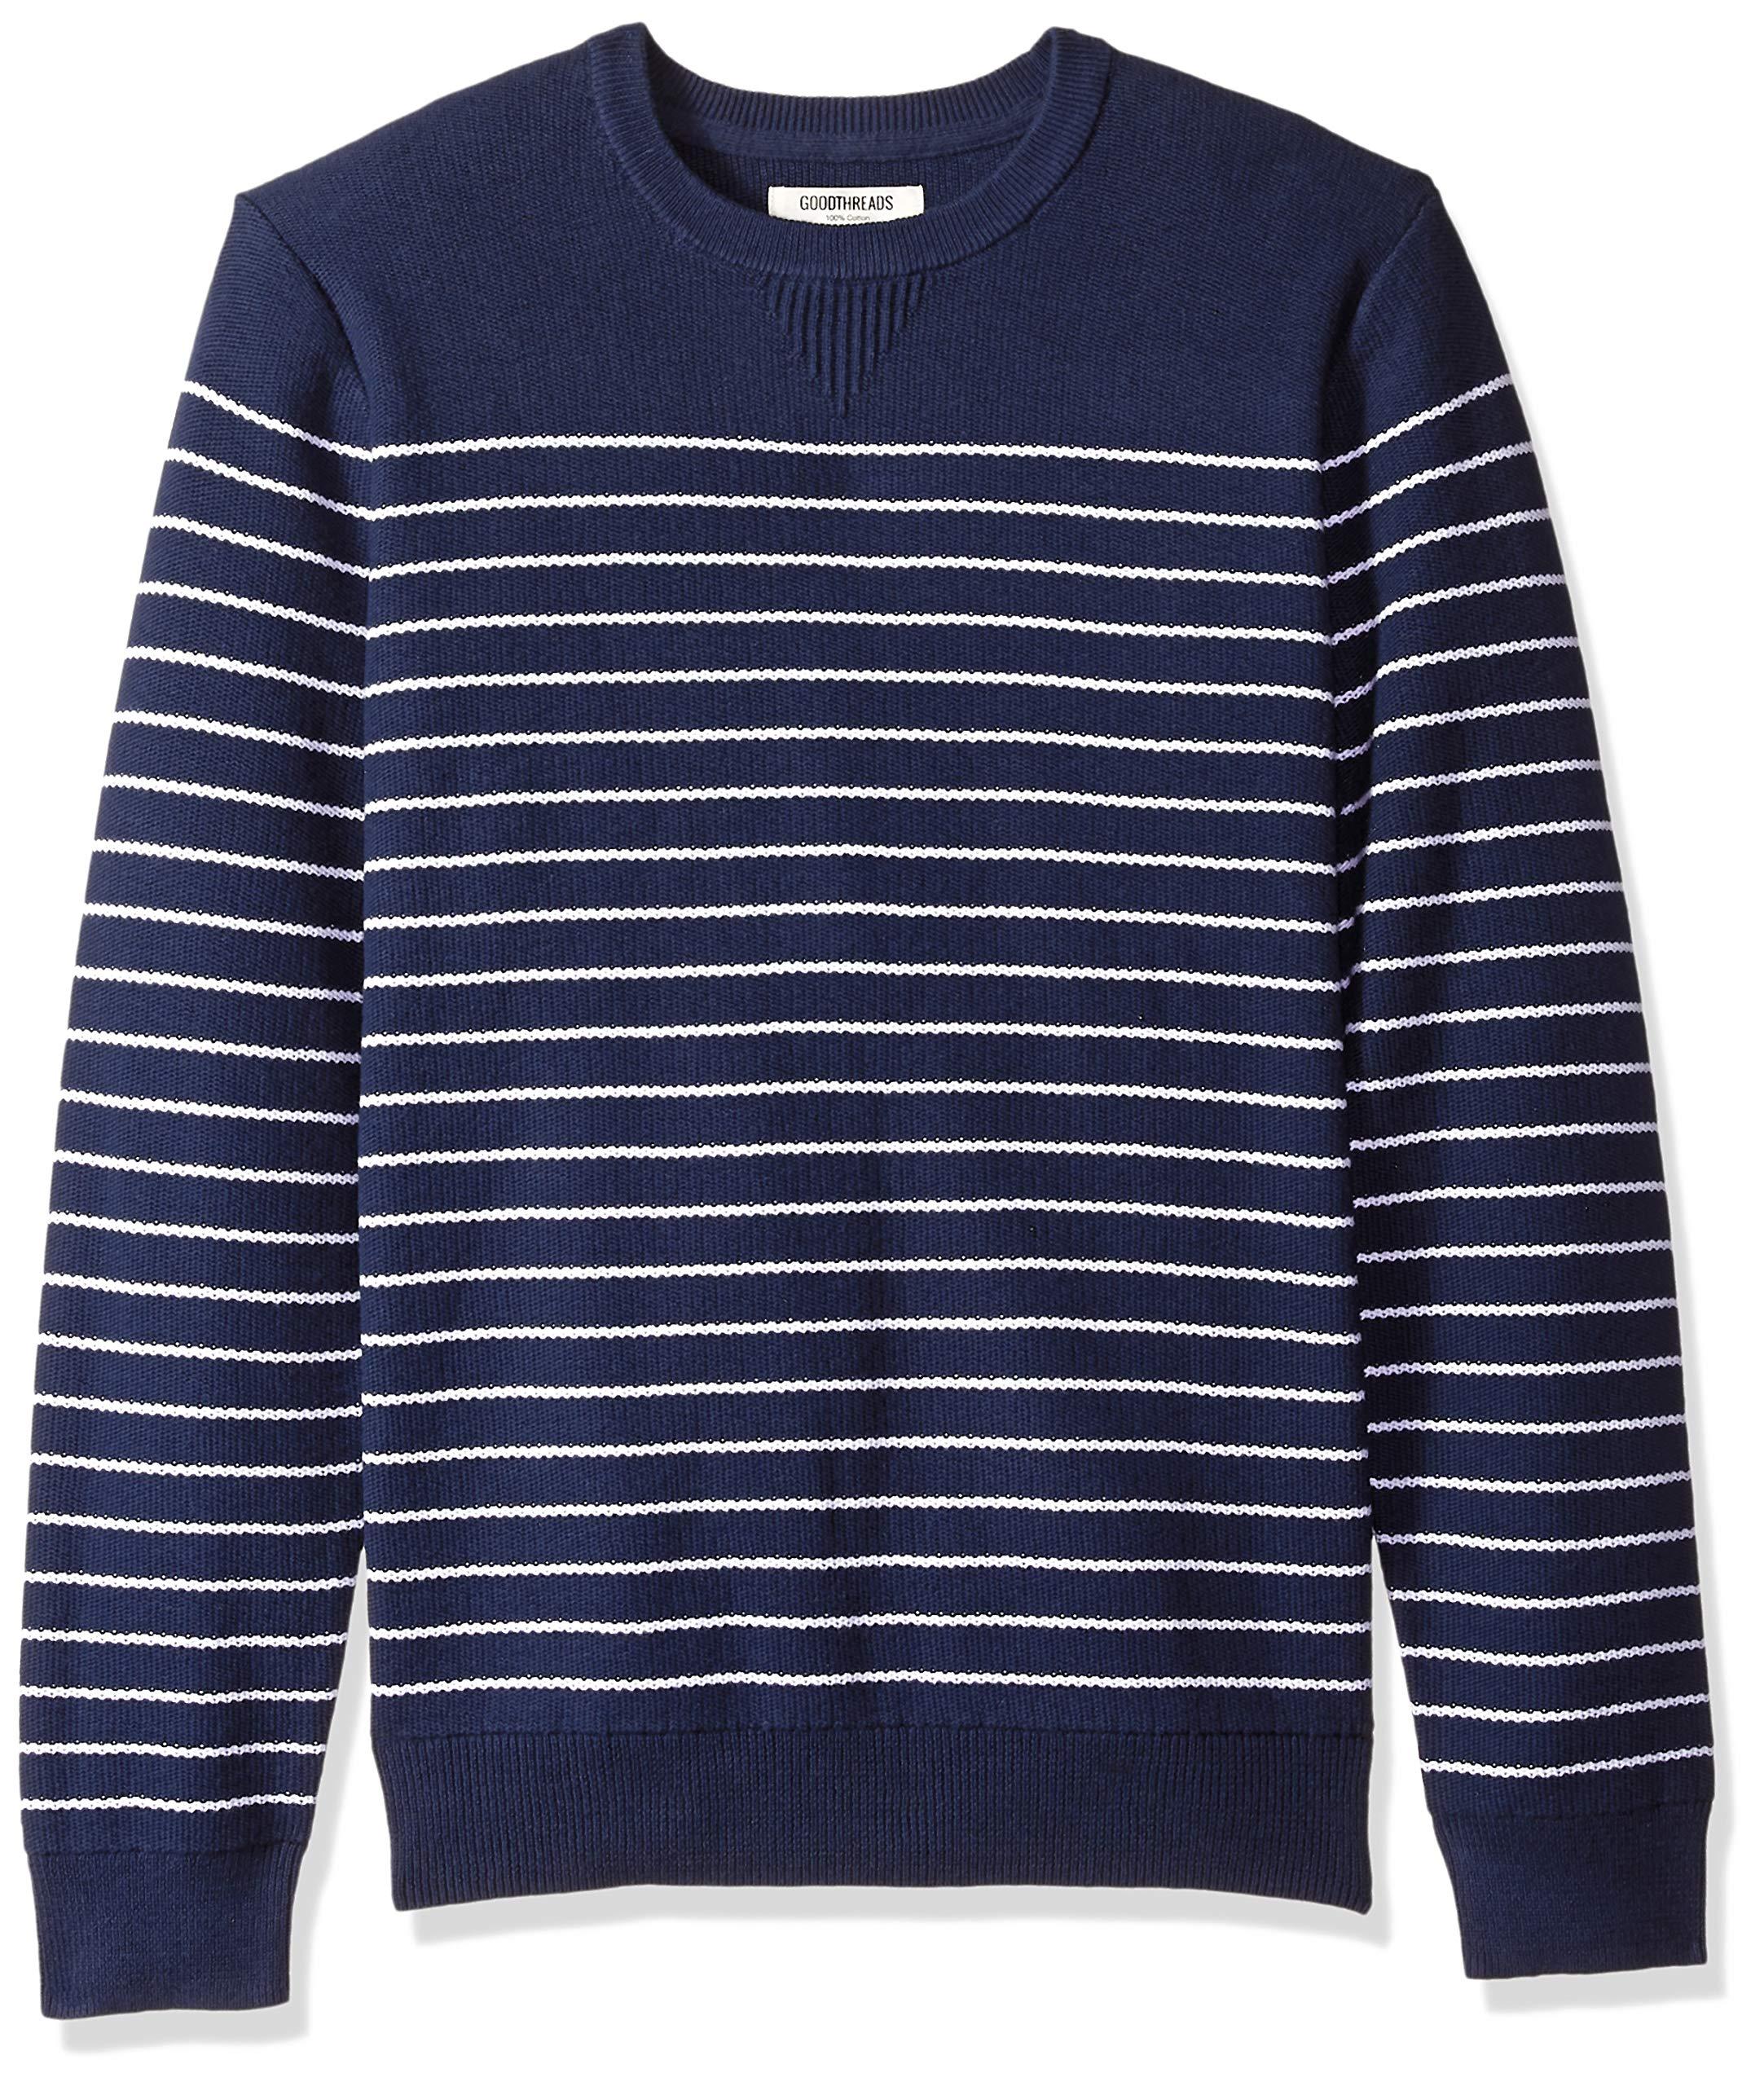 Goodthreads Men's Soft Cotton Striped Crewneck Sweater, Navy/White, Medium Tall